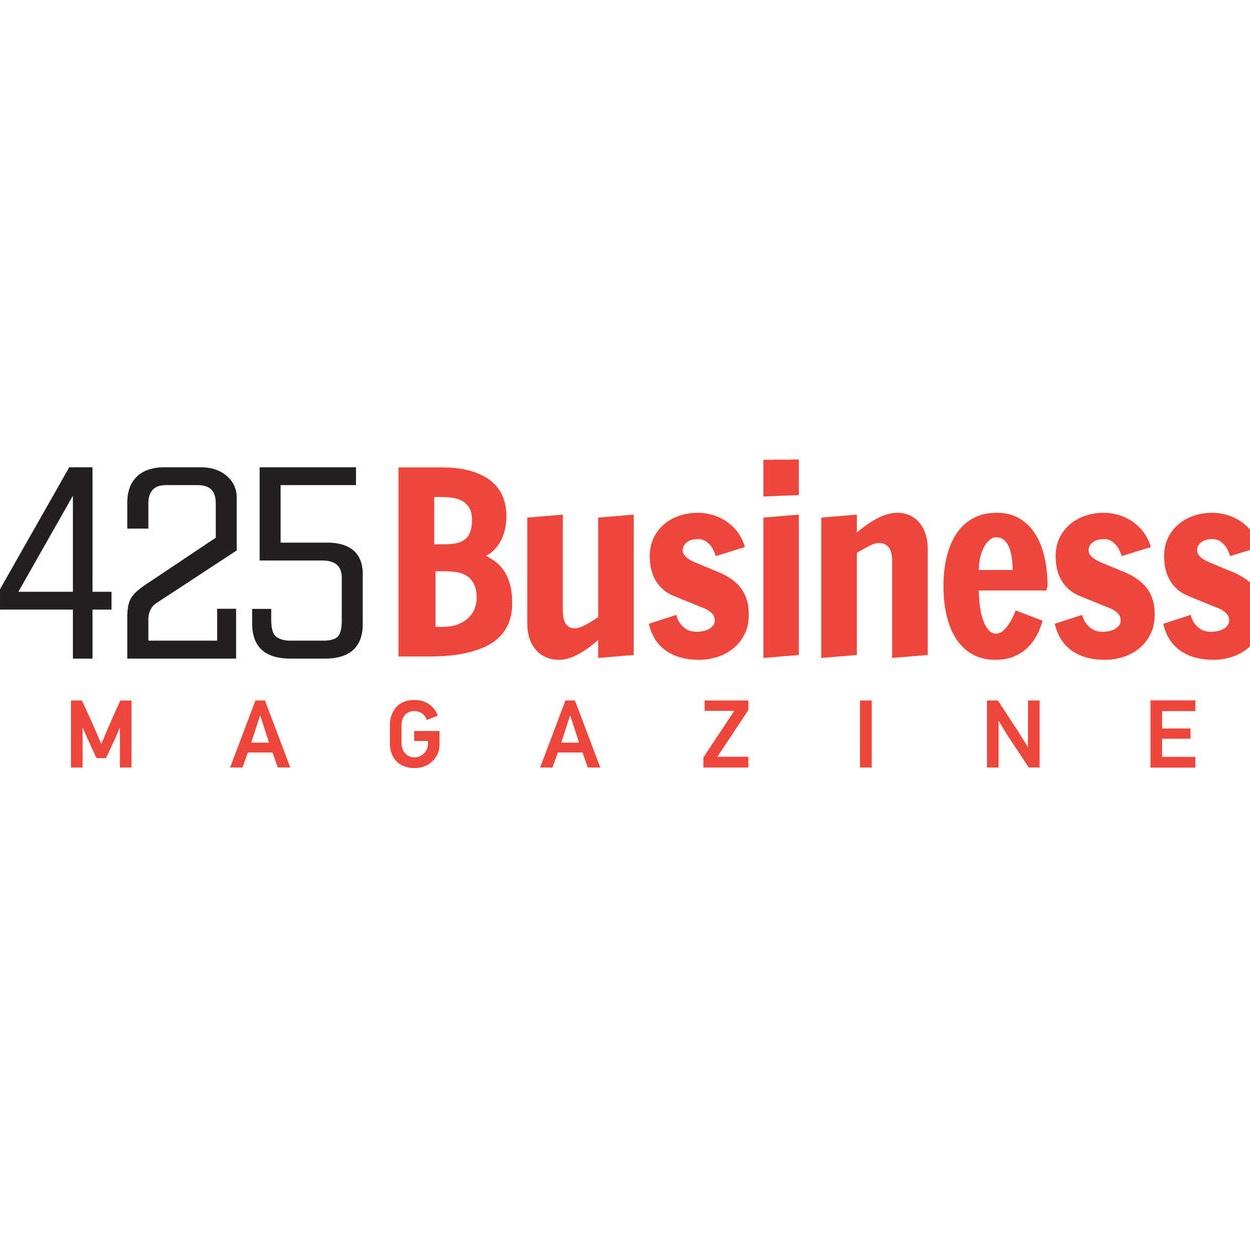 425_425Business_Logos.jpg